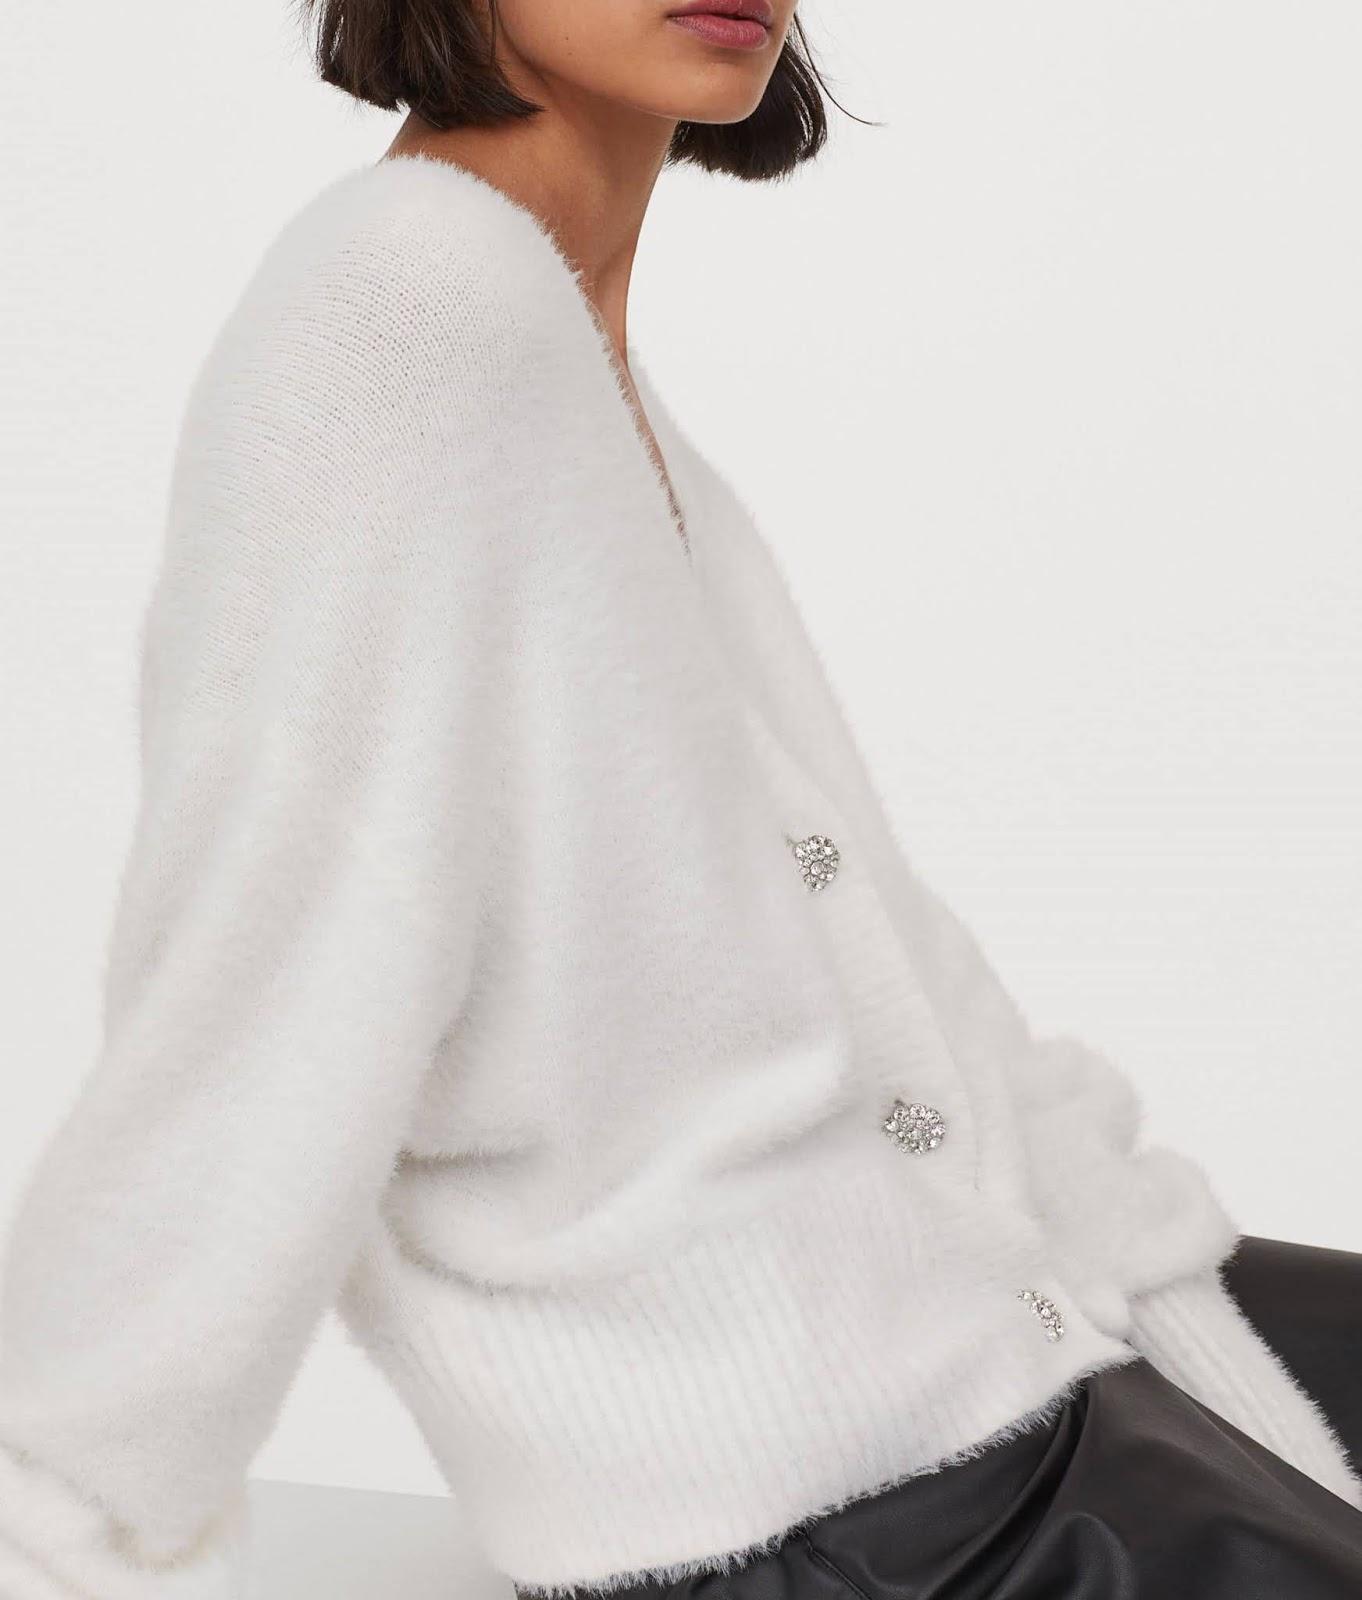 rhinestone-button cardigan